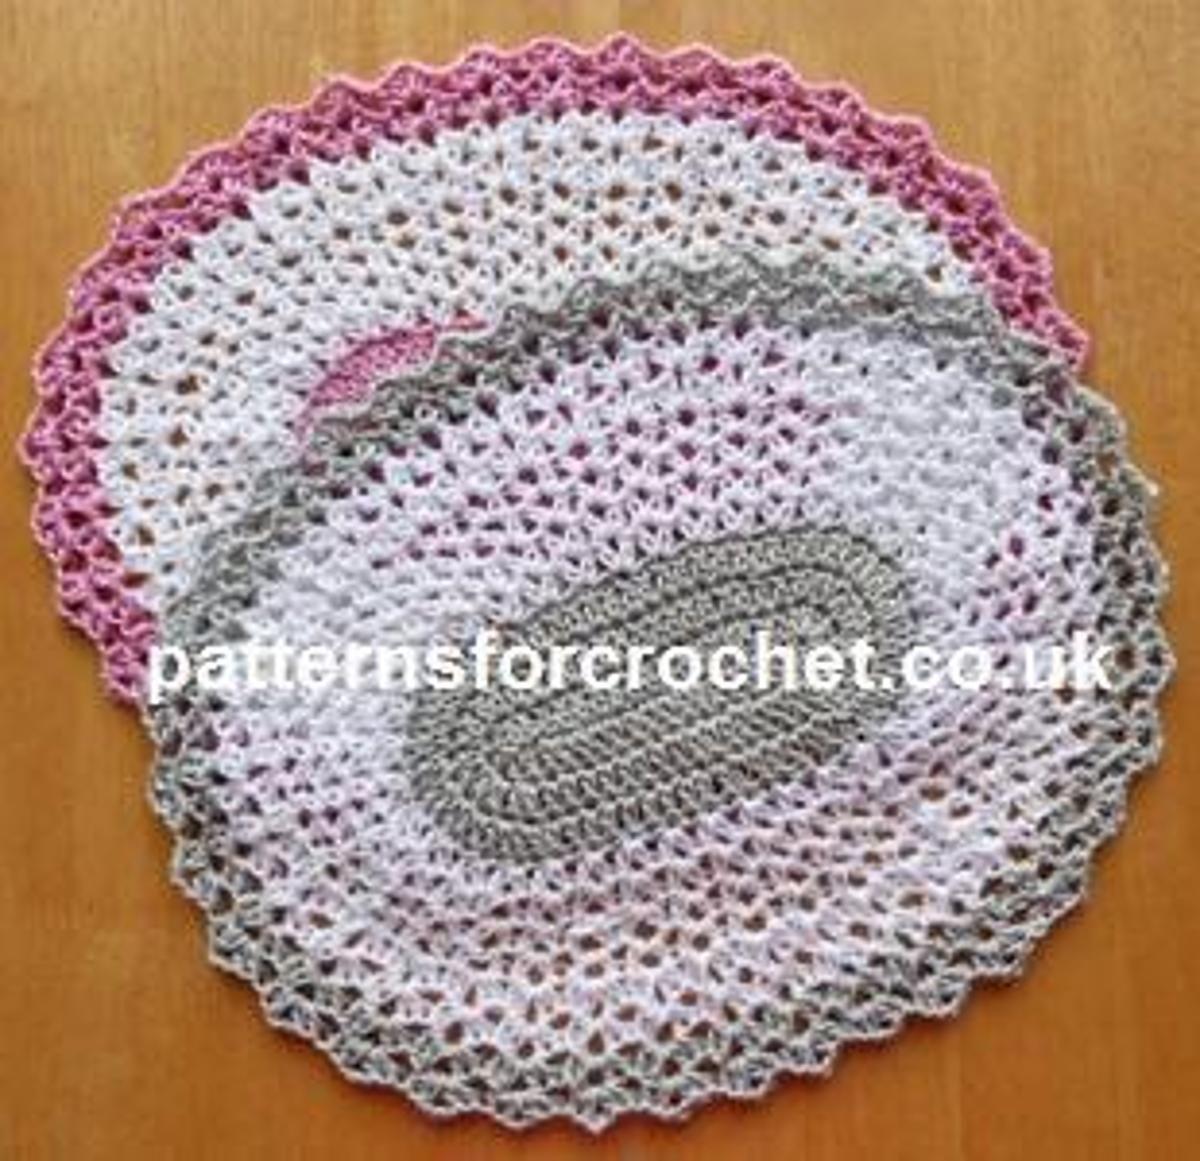 Pfc233 Oval Table Mat Crochet Pattern Crochet Pinterest